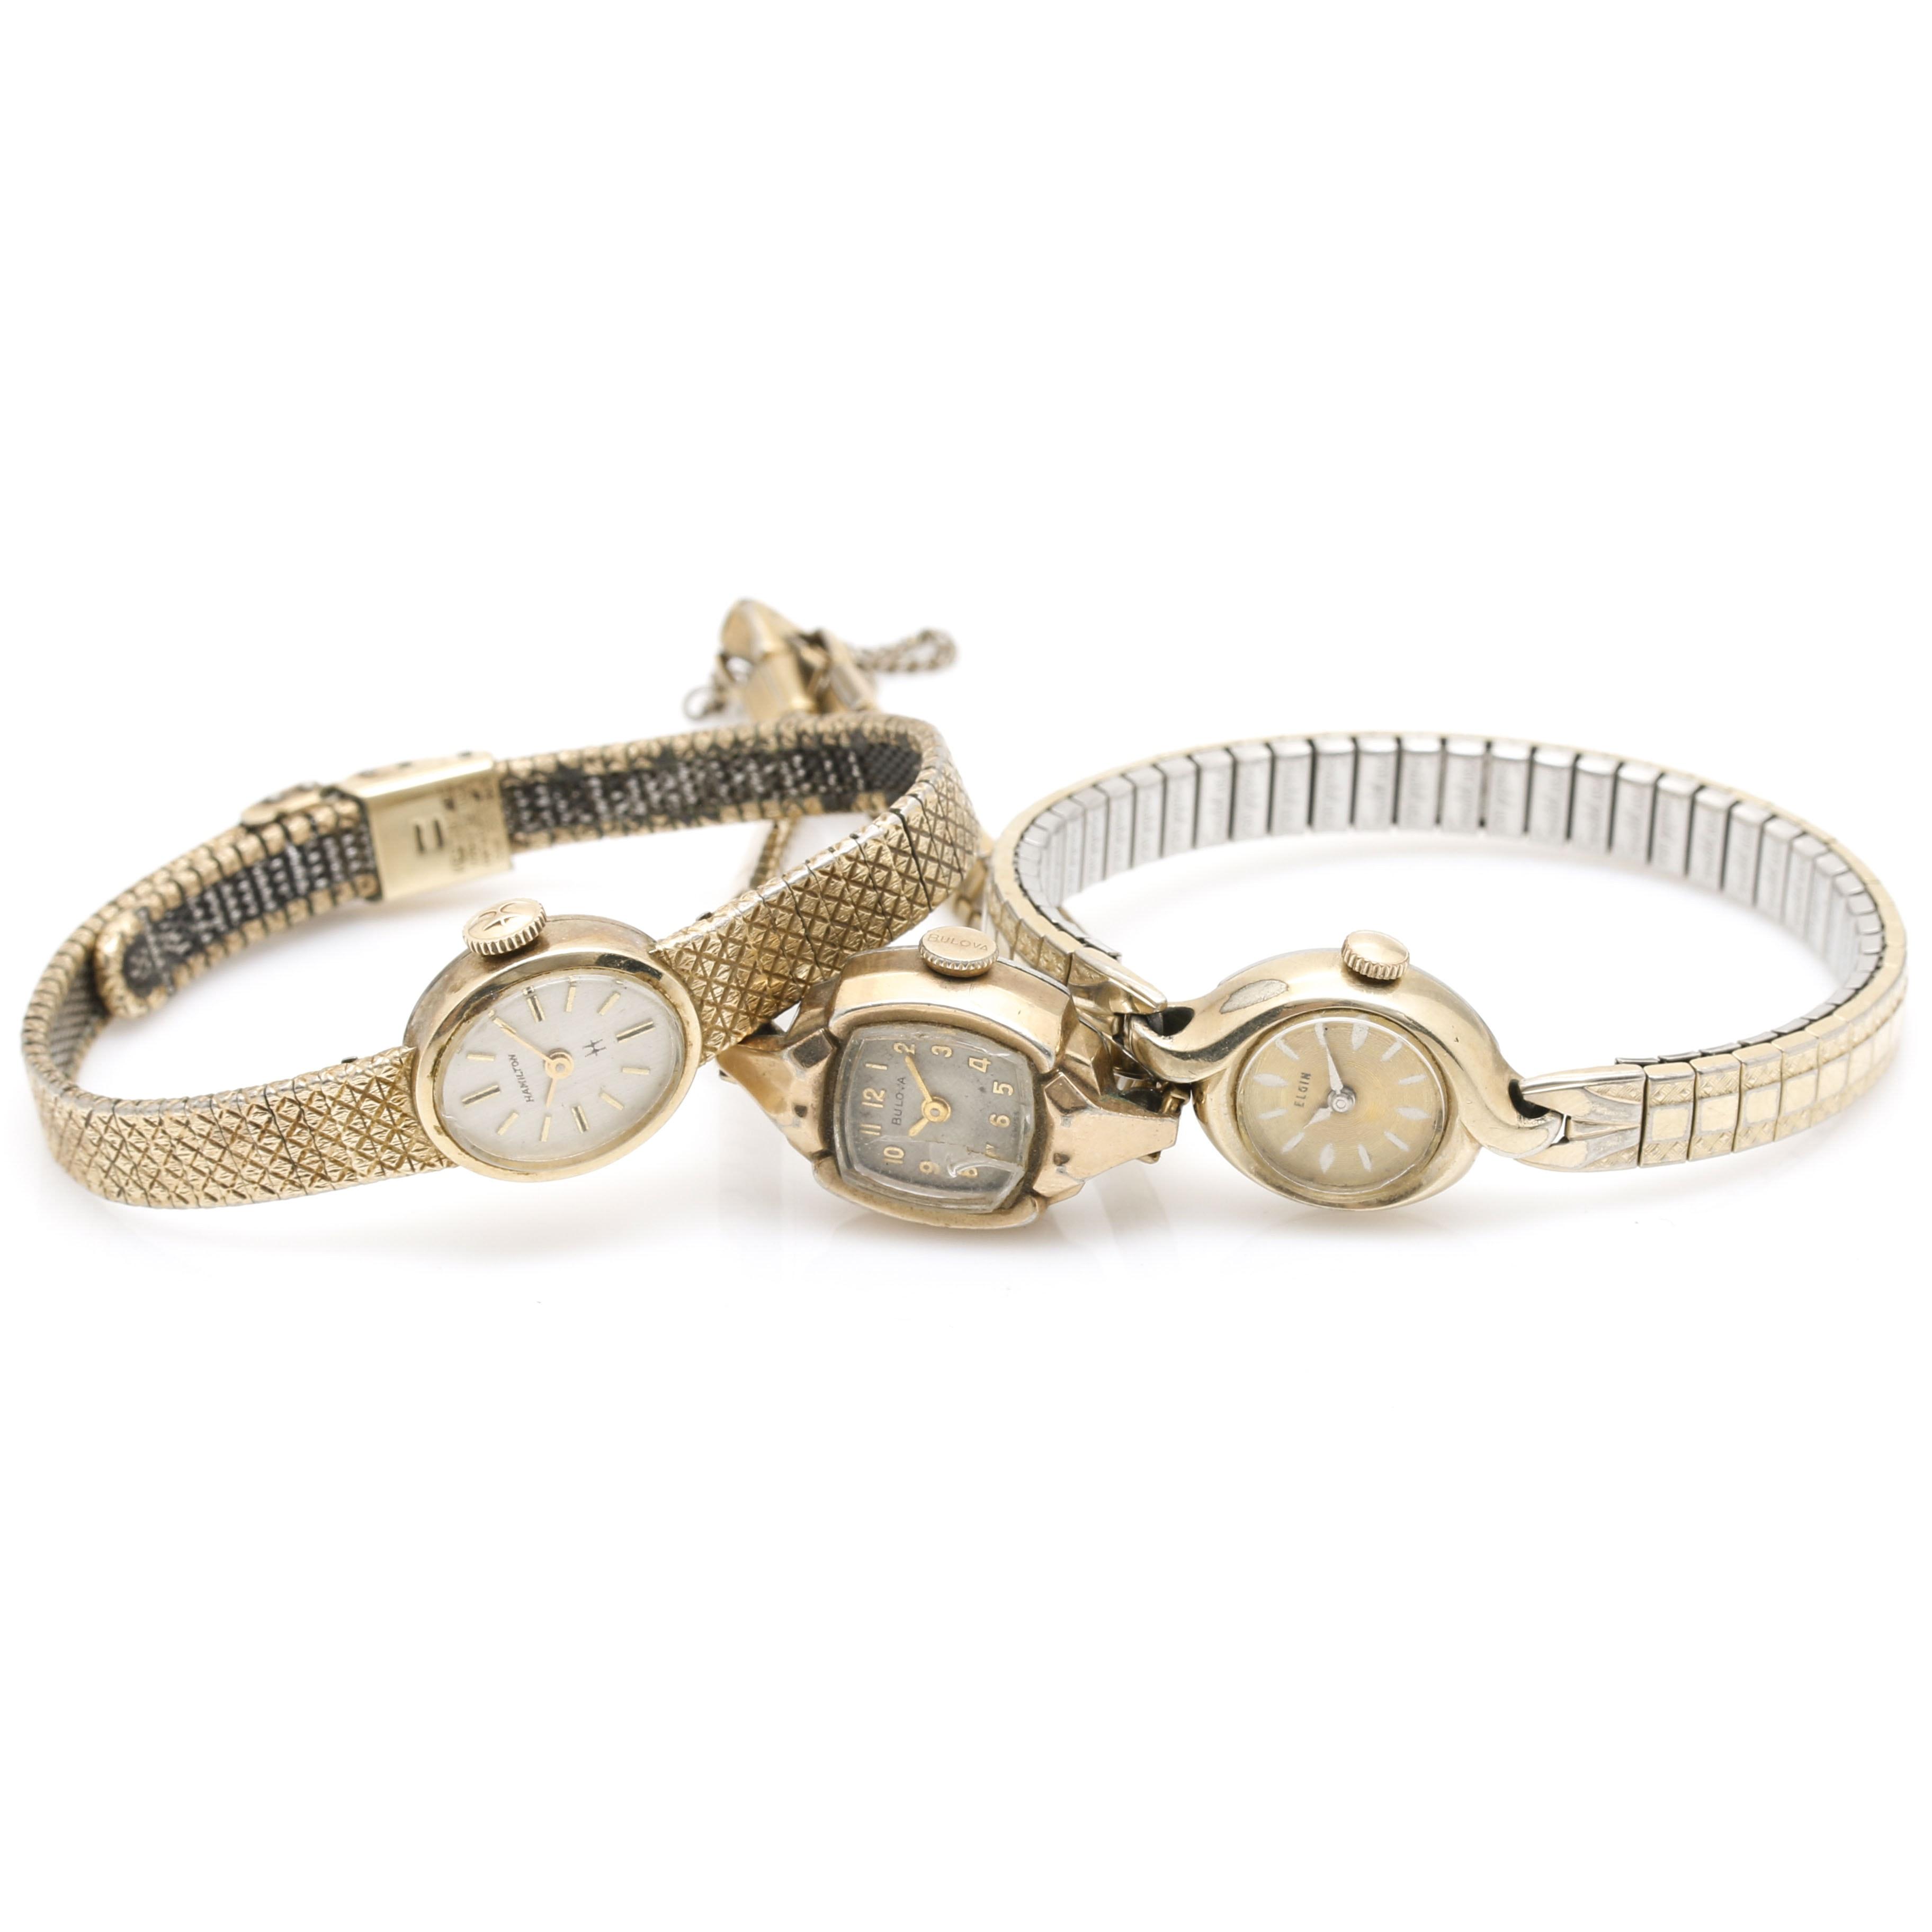 Wristwatches Including Bulova